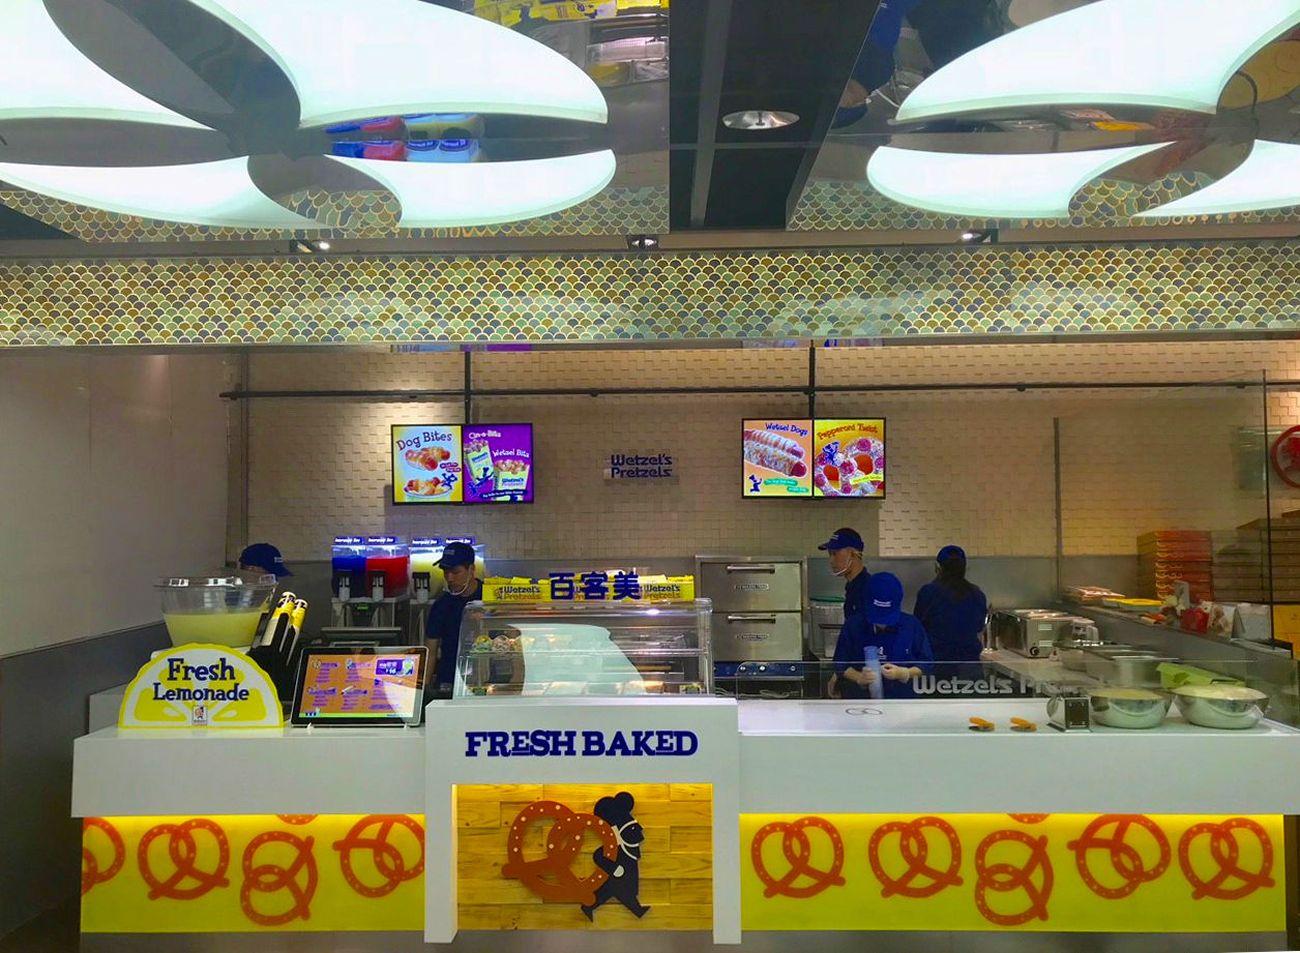 Wetzel's Pretzels Opens First Location in China